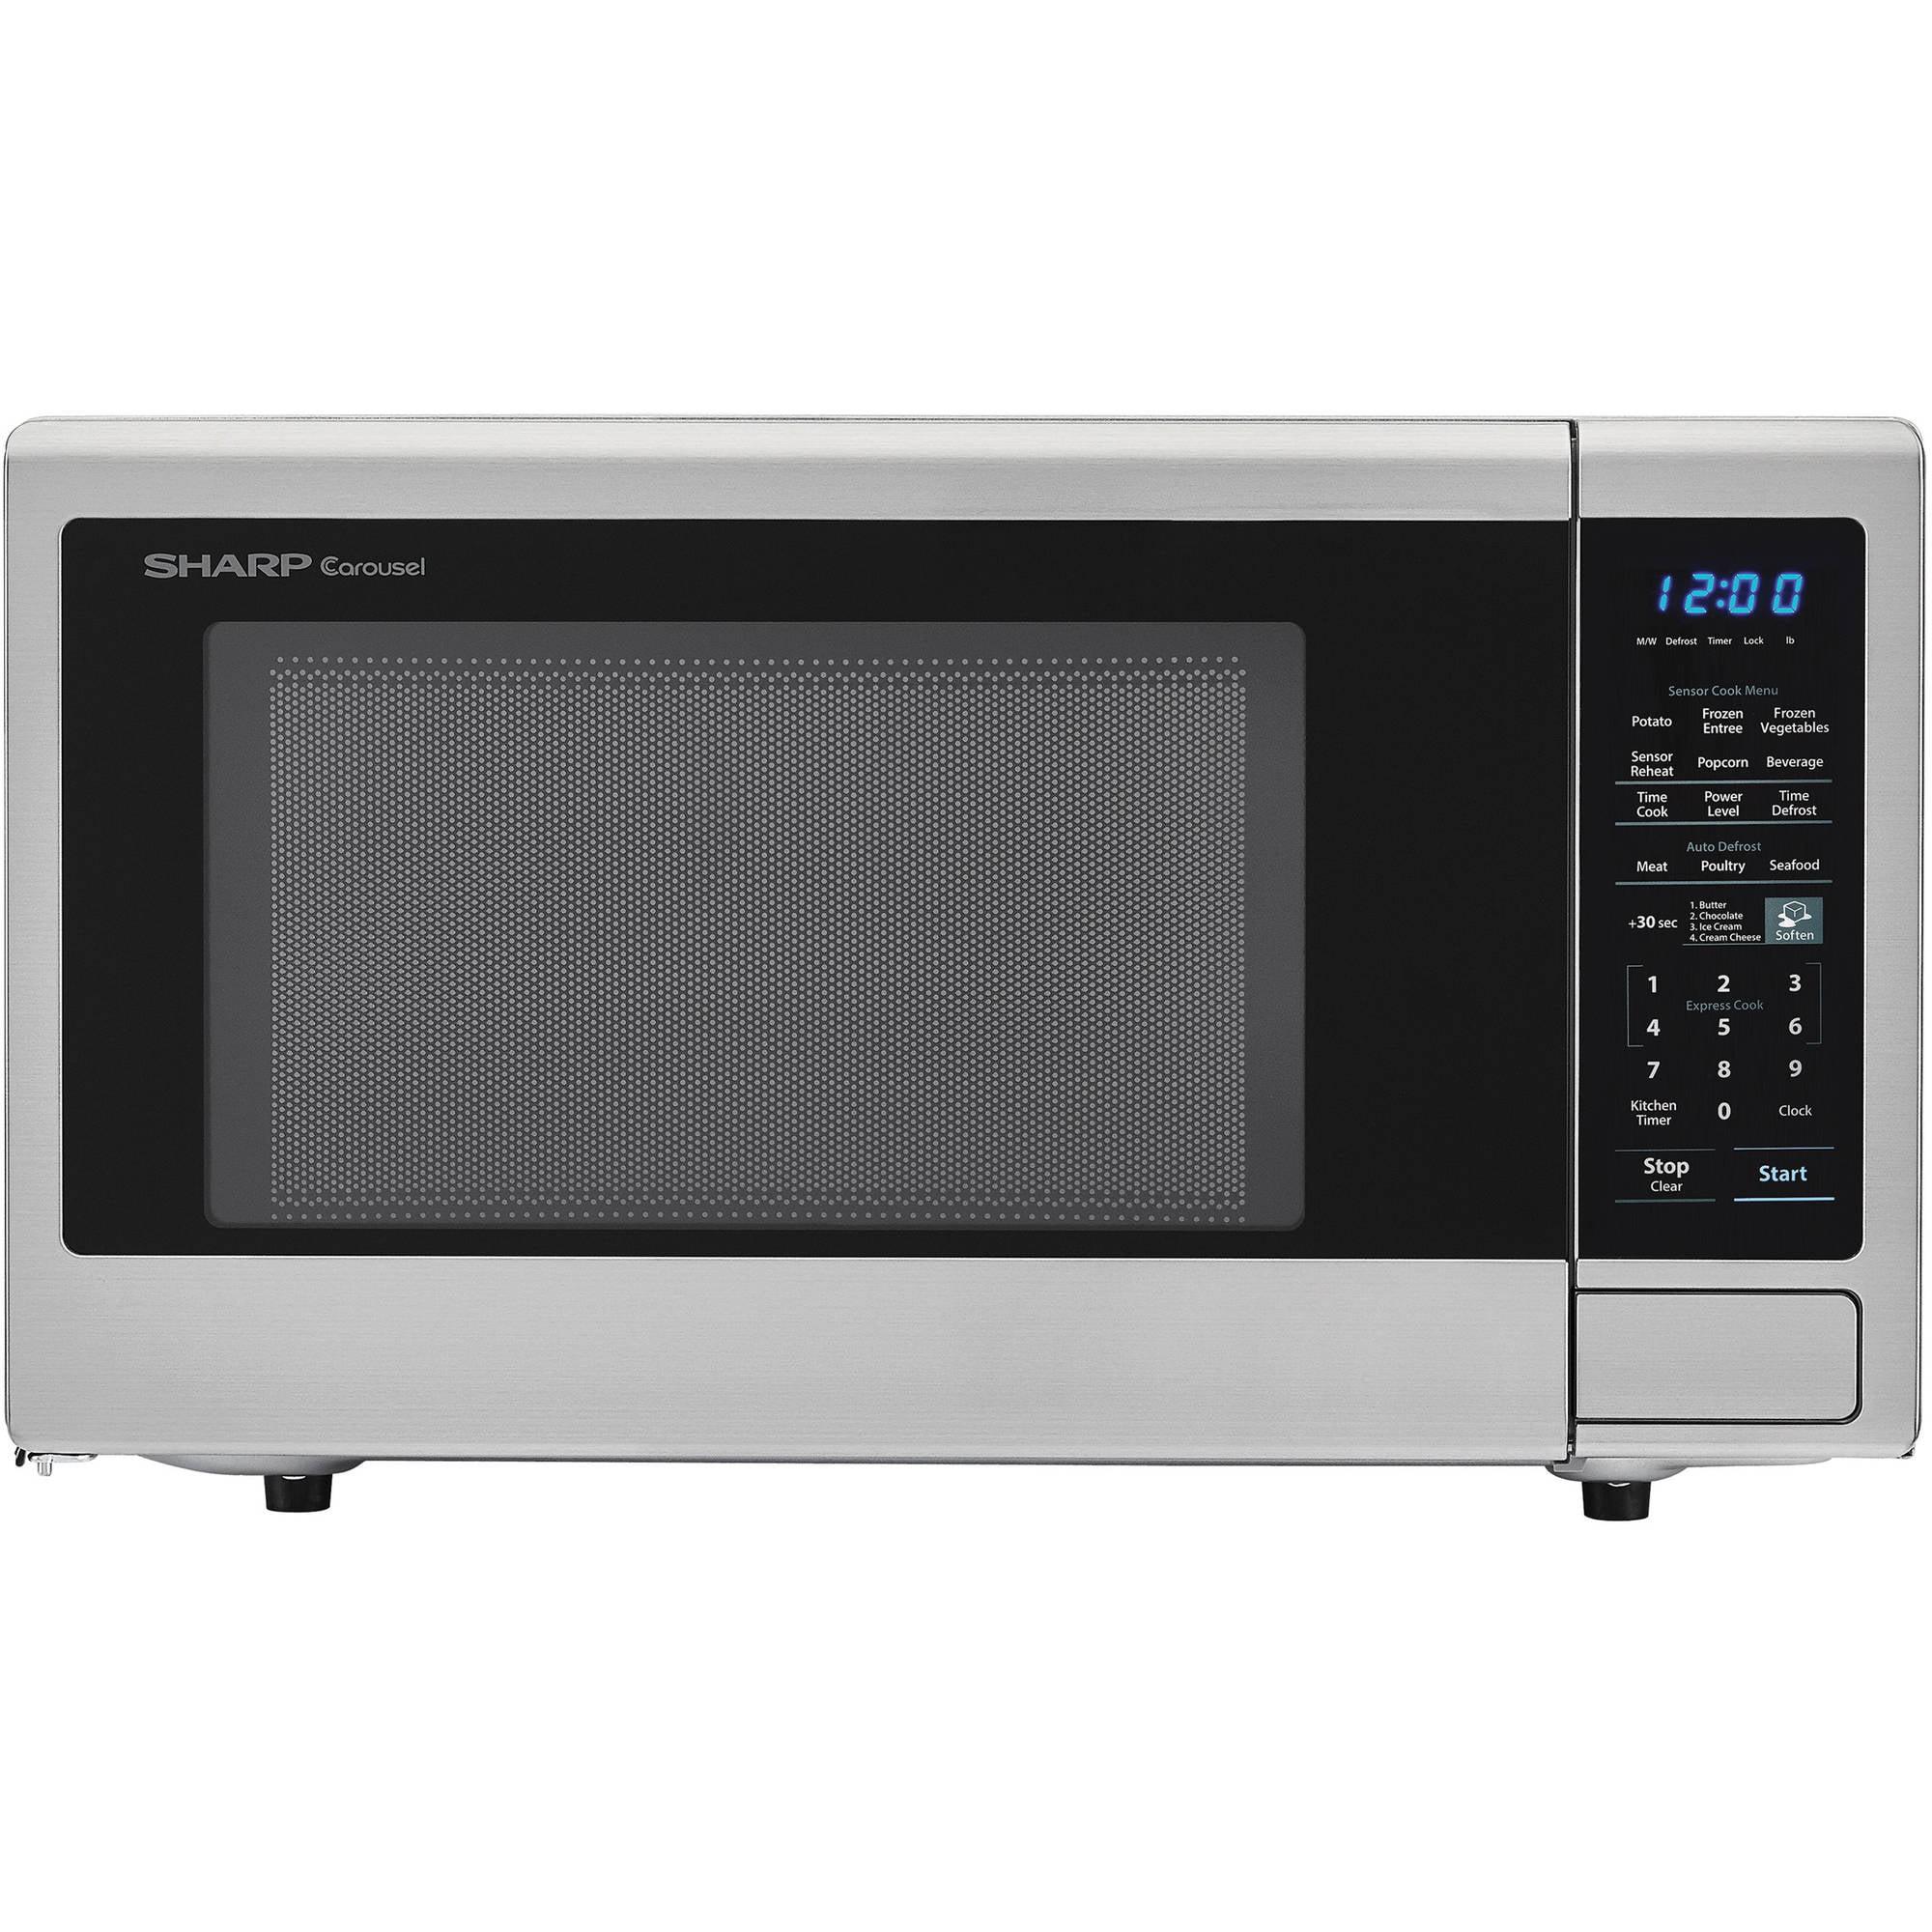 sharp zsmc1842cs 1 8 cu ft microwave stainless steel